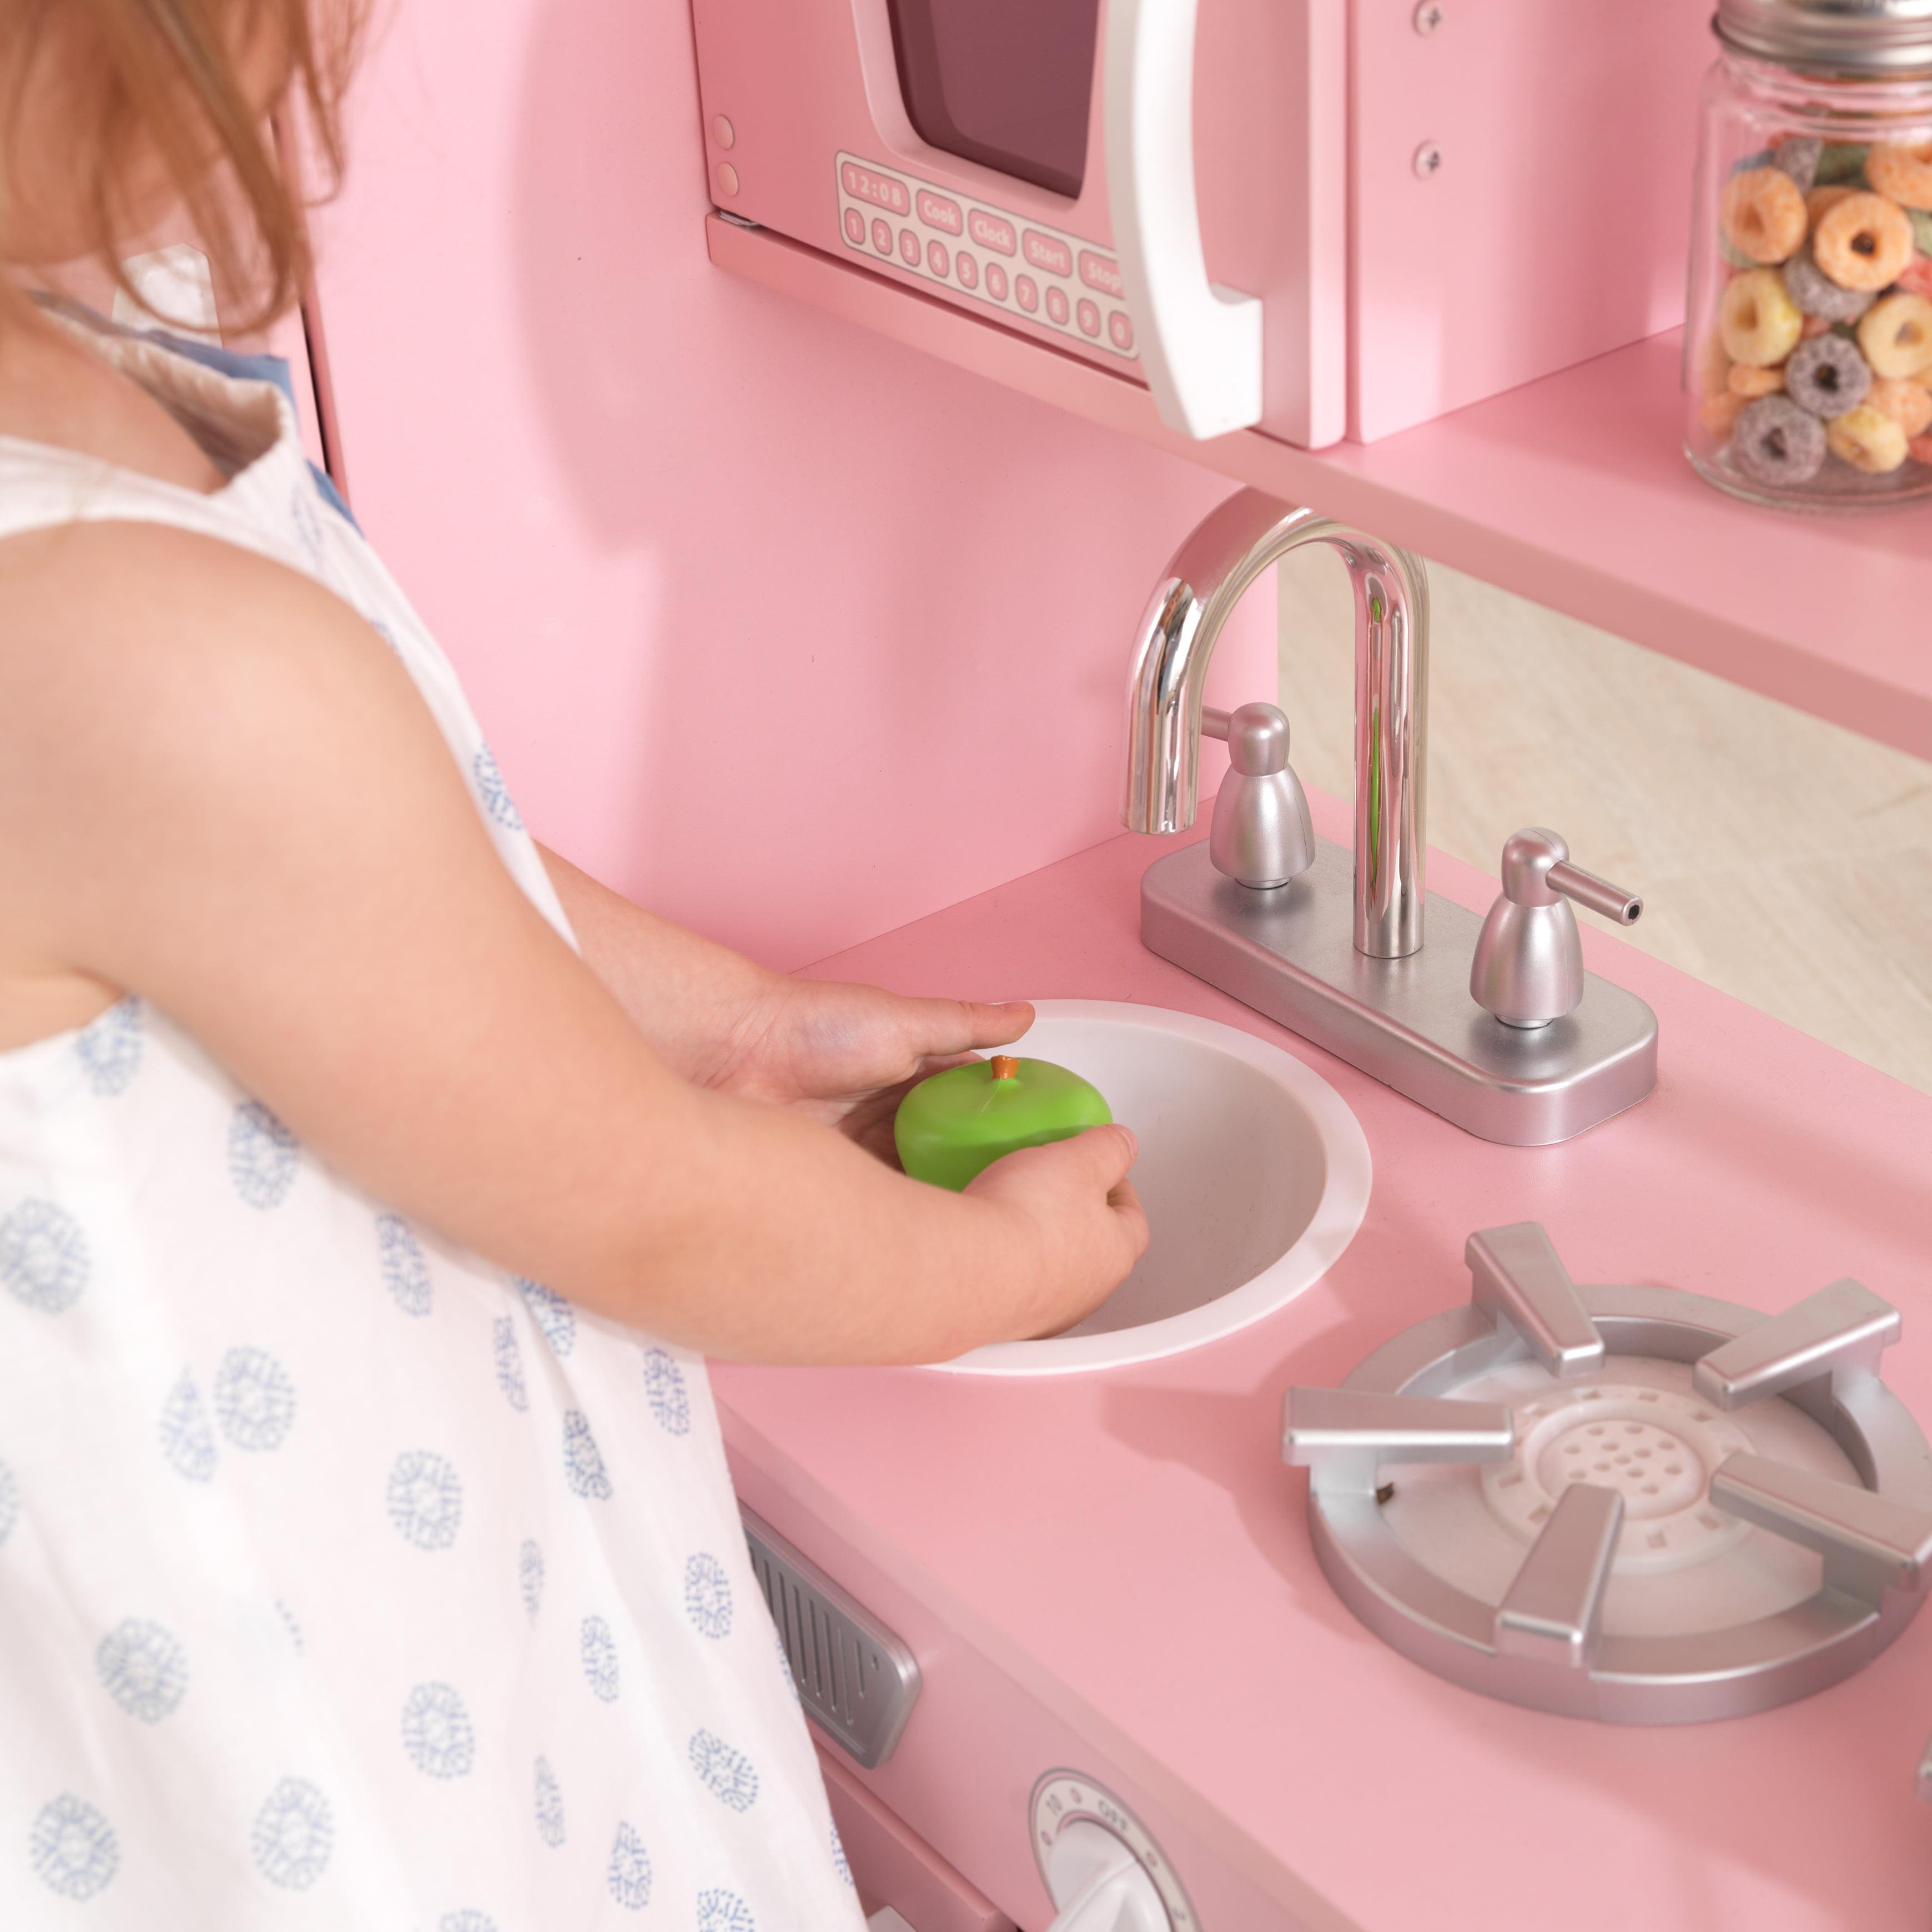 KidKraft Vintage Play Kitchen - Pink - Walmart.com